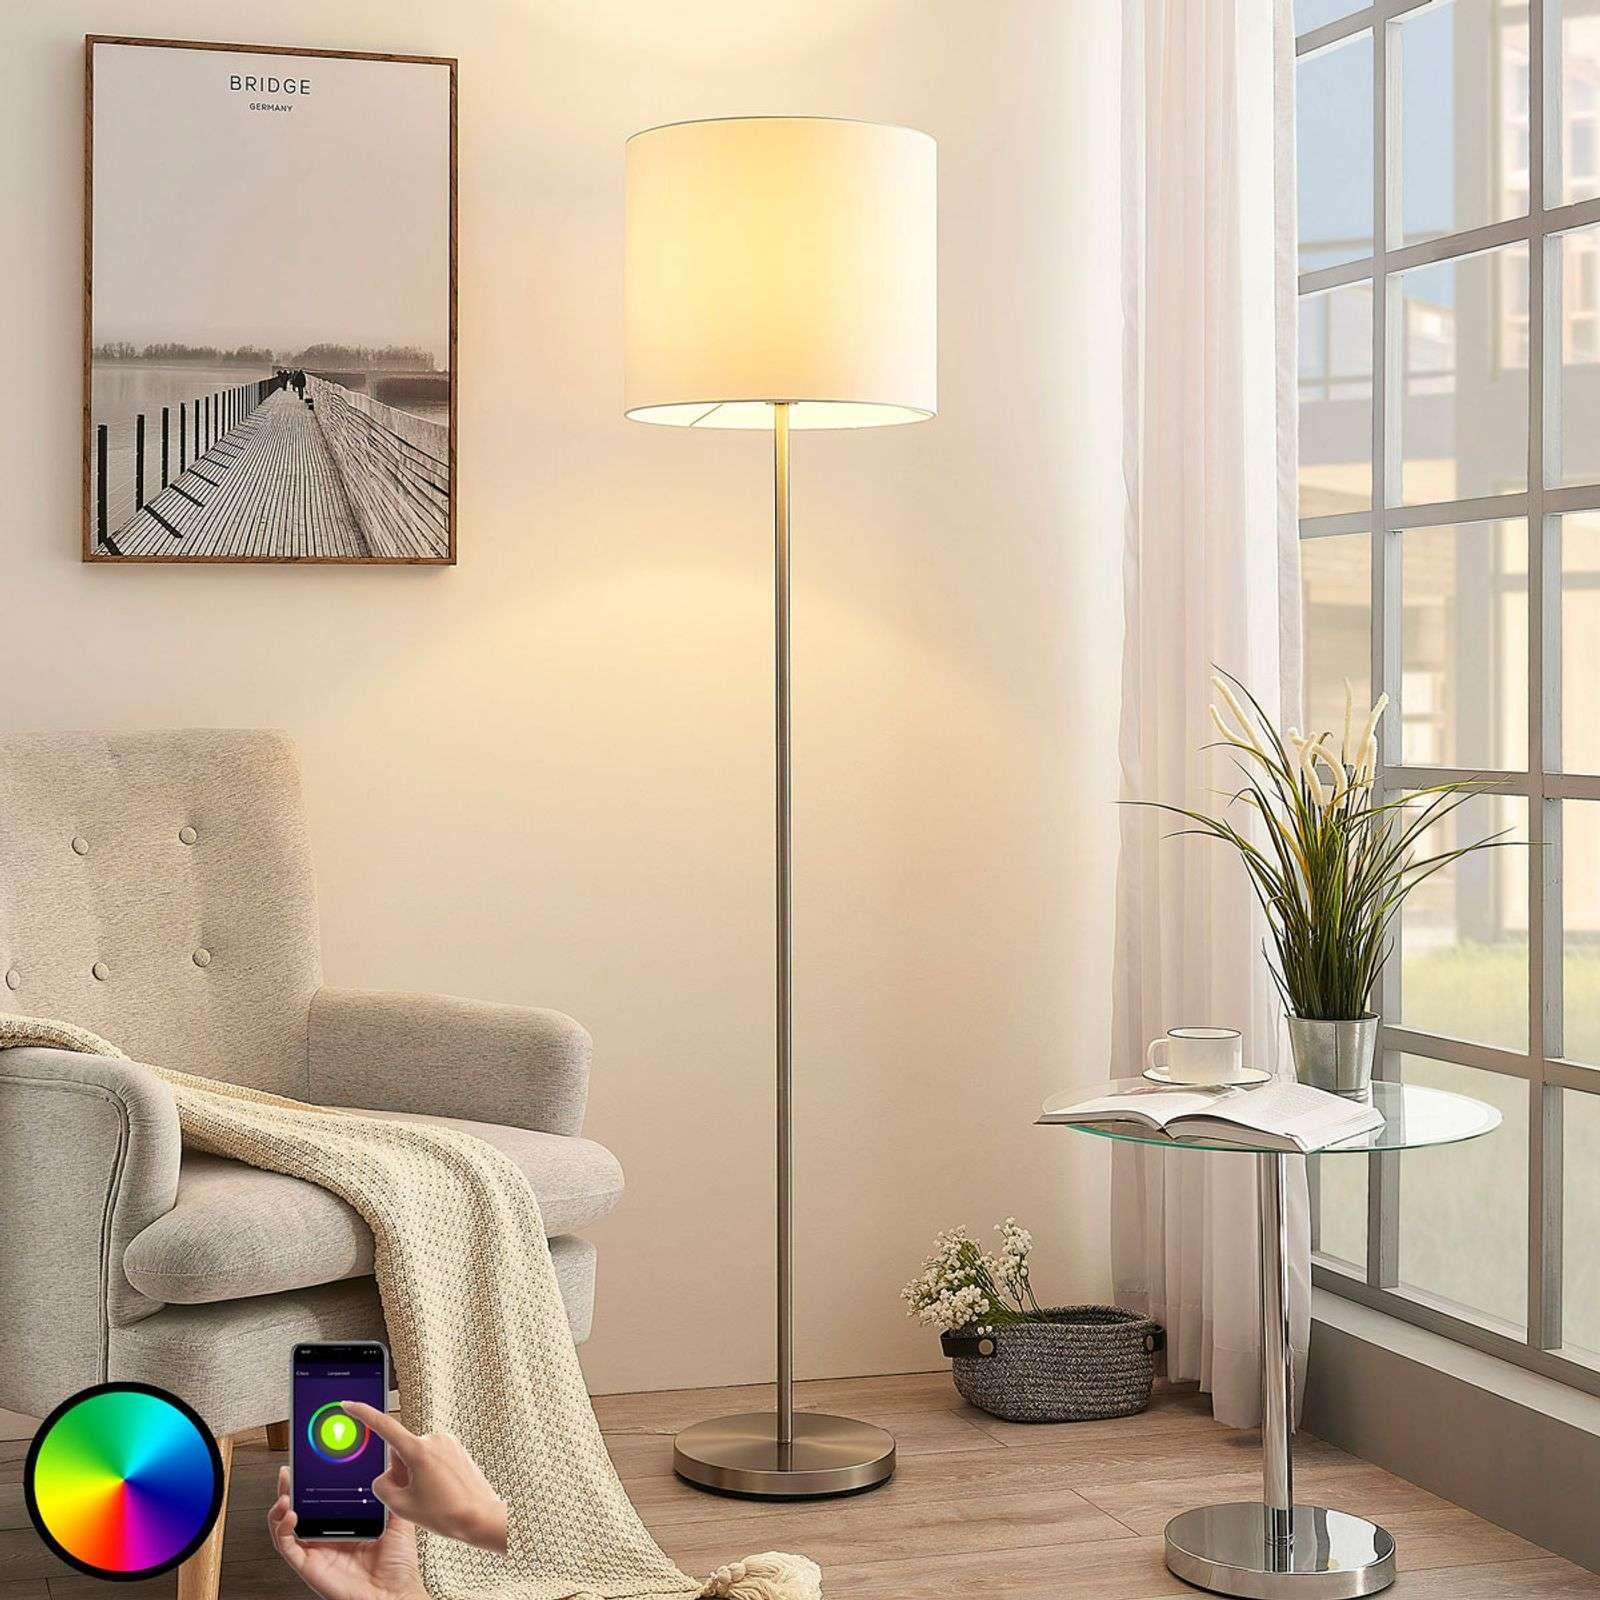 Lindby Smart Led Vloerlamp Everly App Rgb In 2020 Lampenwelt Intelligente Psychologisch